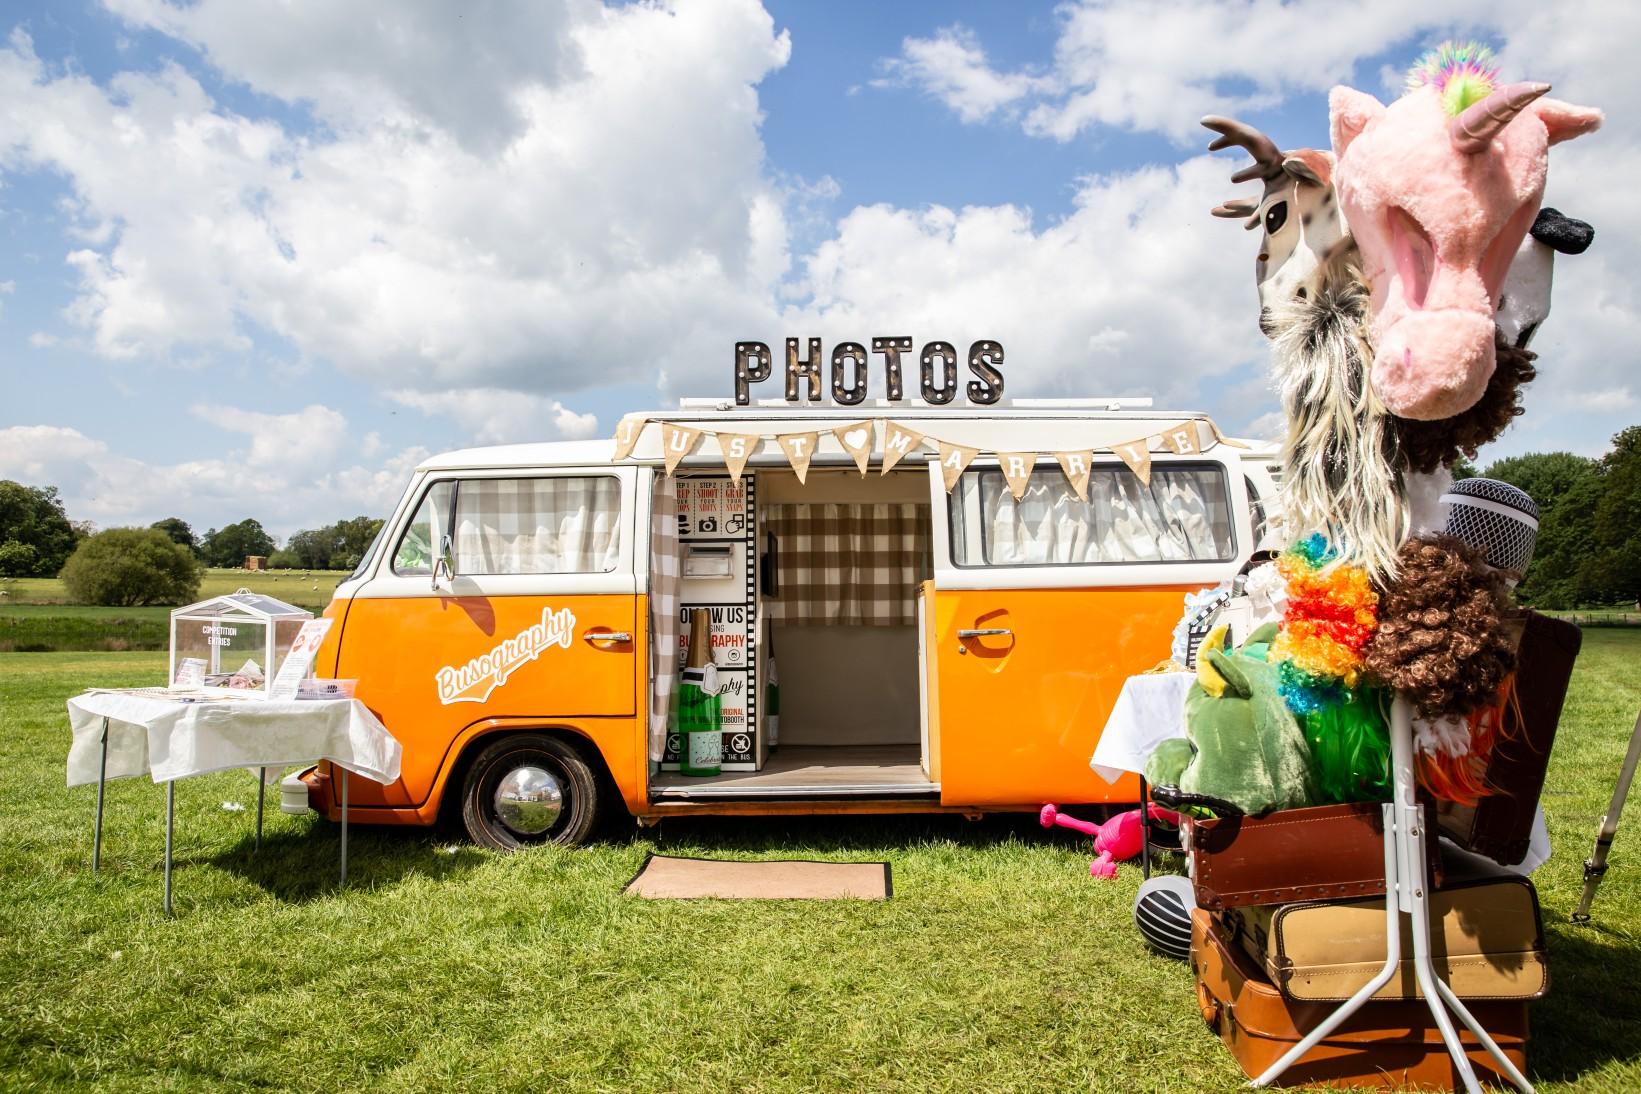 Festival wedding - Unconventional Wedding Festival - Busography - Lumiere wedding photography - photo booth - wedding photo booth (2)